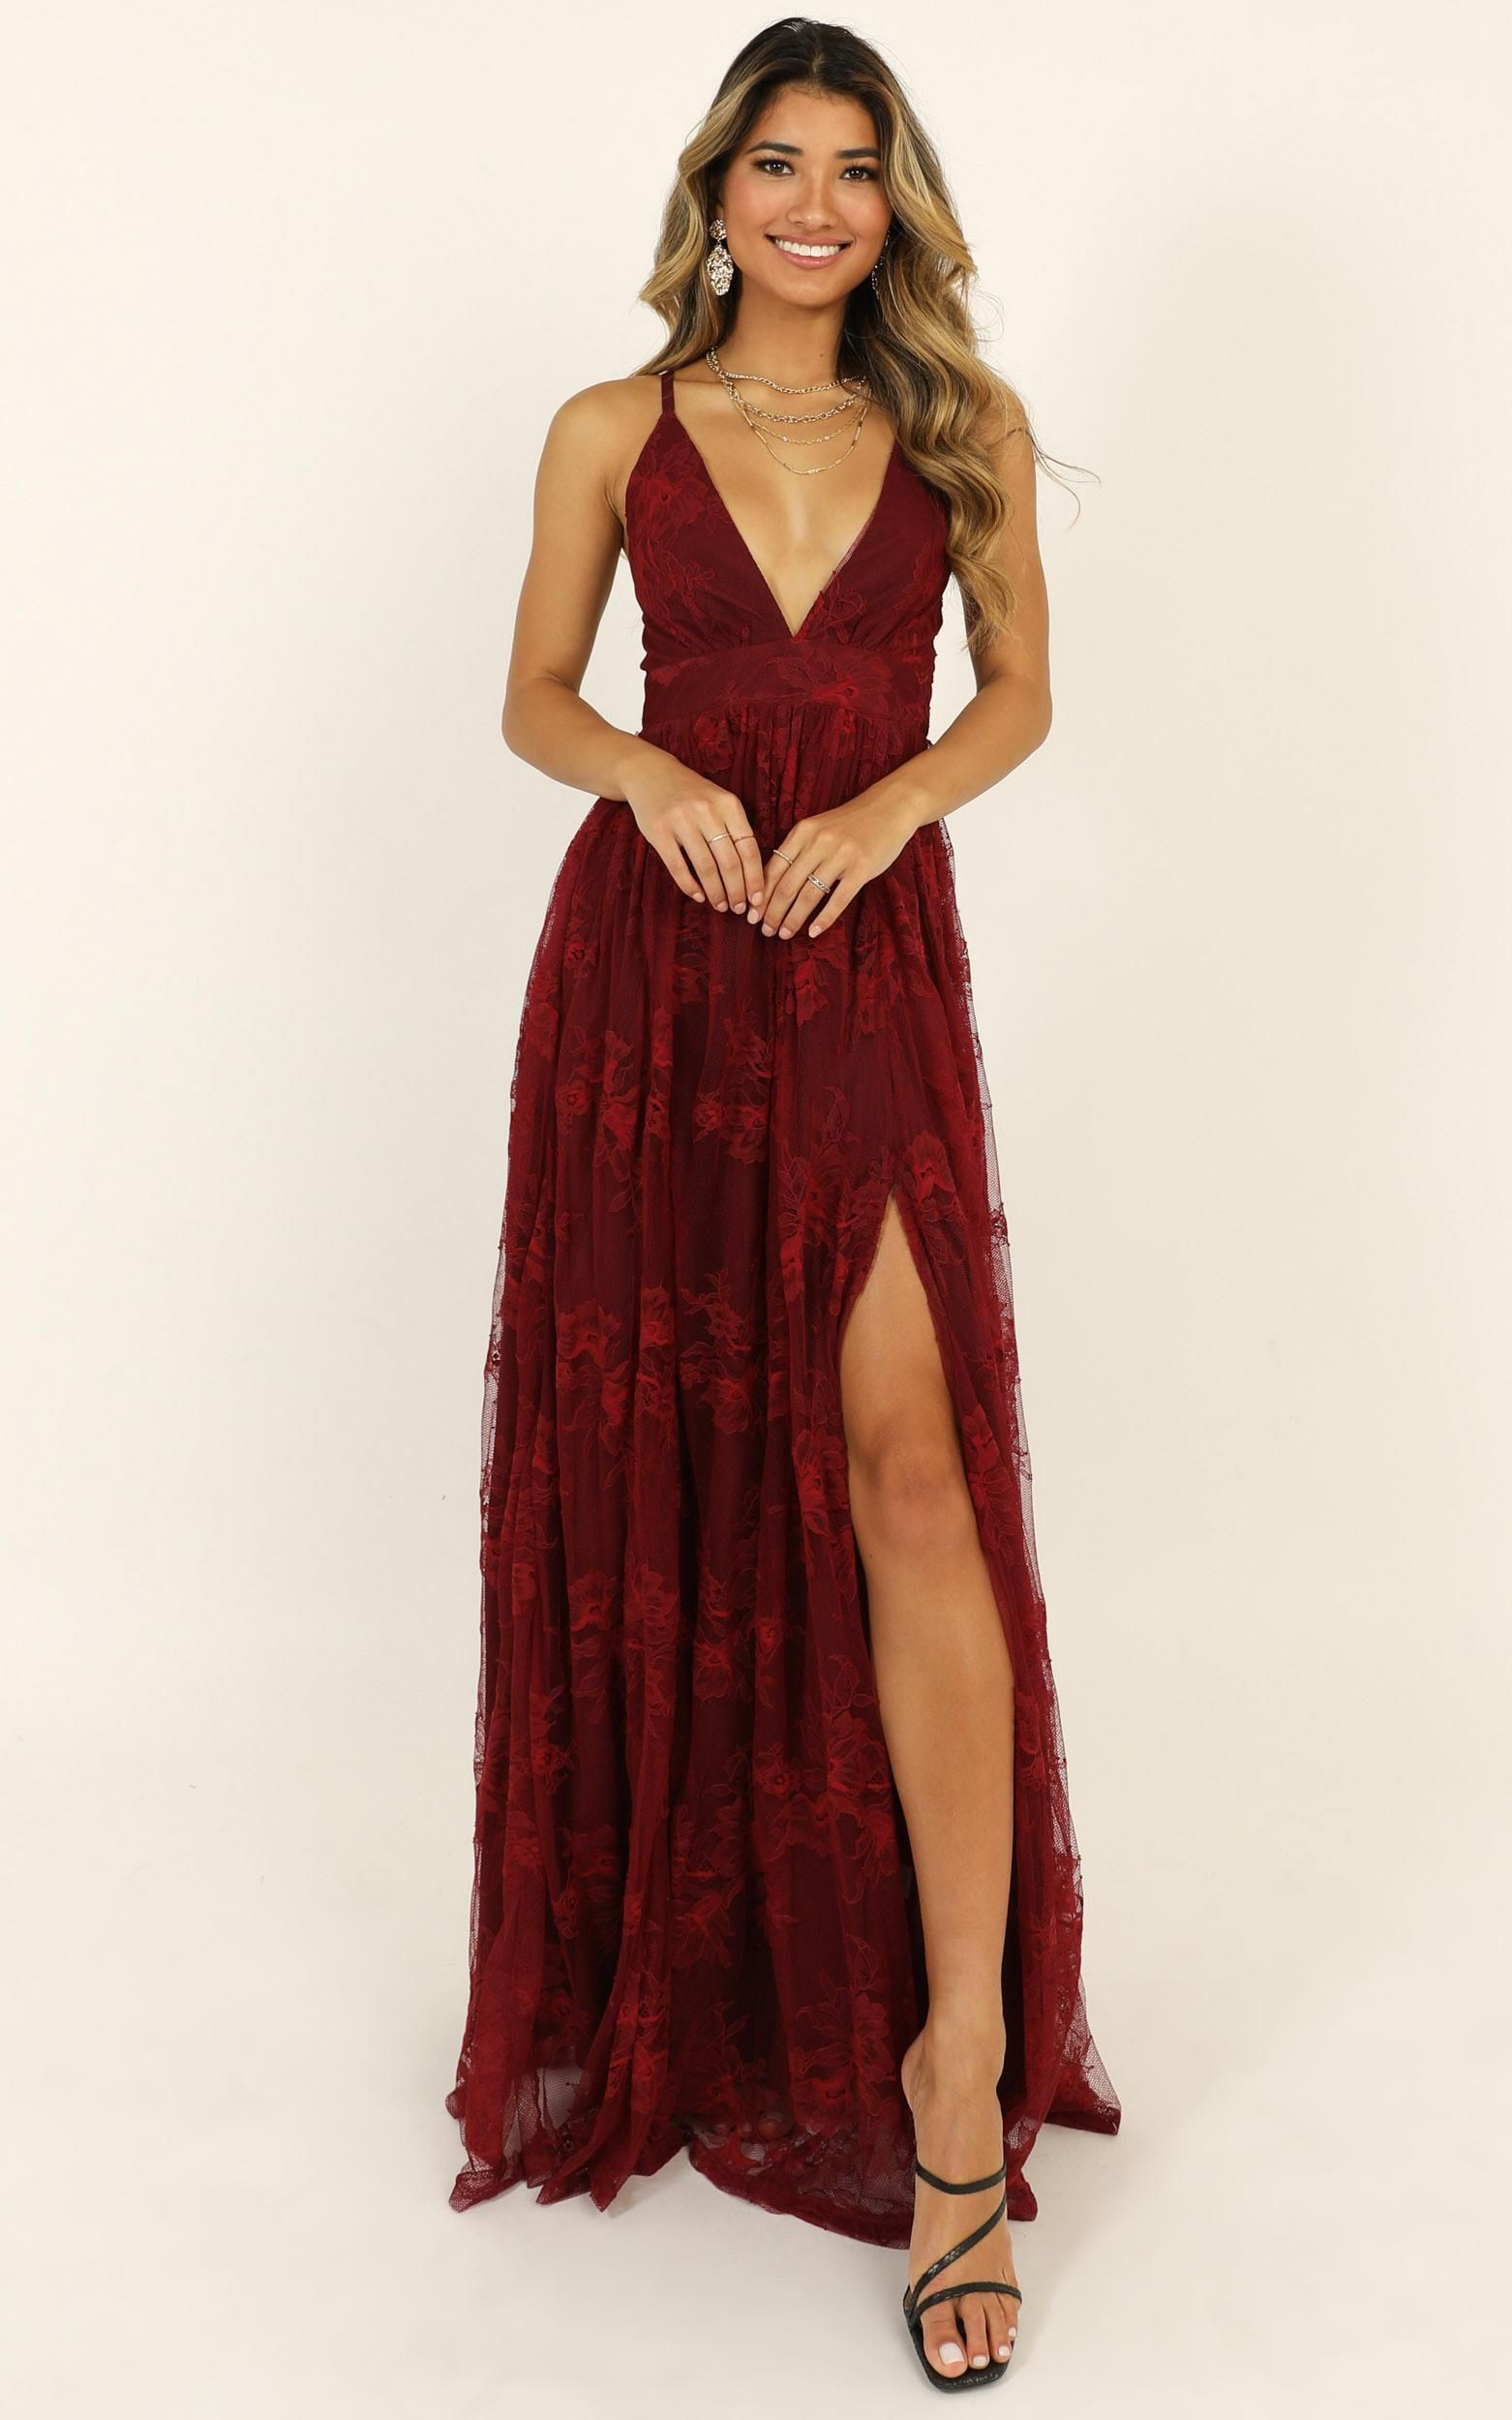 Prom Loving Dress In Wine Lace Showpo Dresses Prom Dresses Stunning Bridesmaid Dresses [ 2500 x 1562 Pixel ]